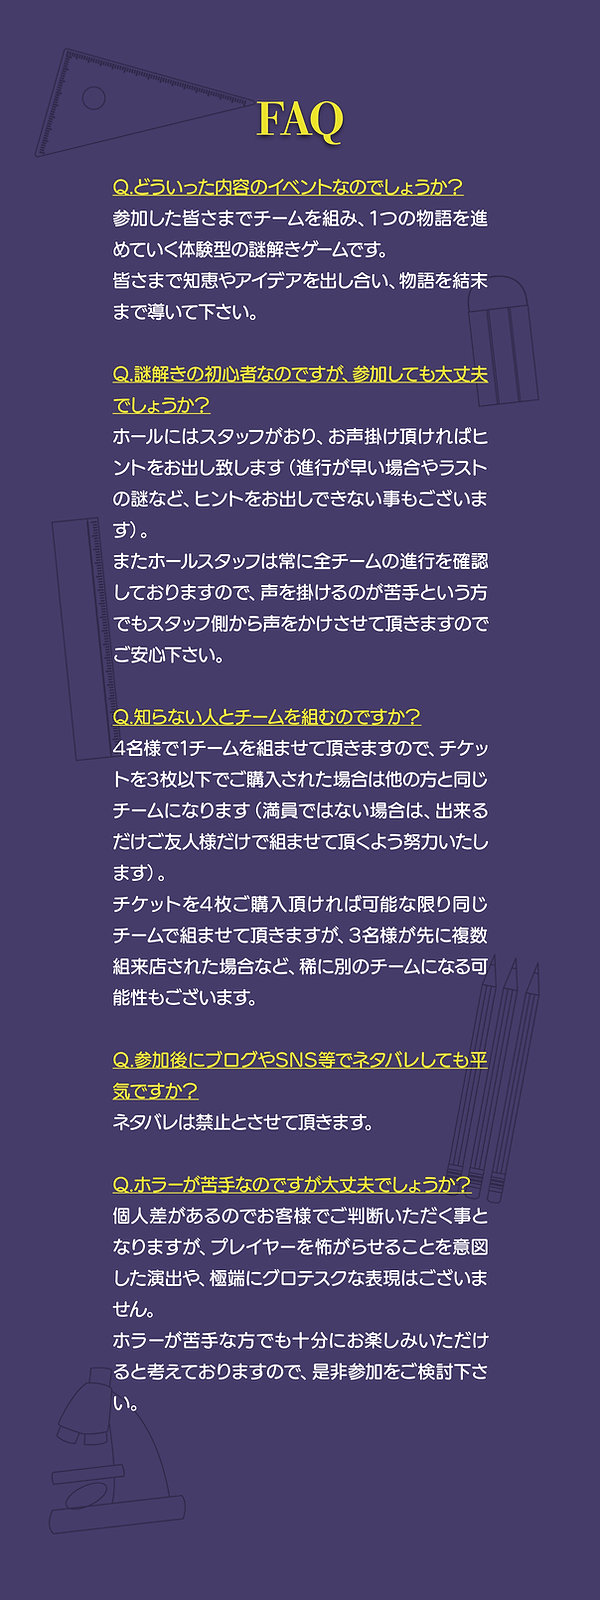 7husigi_3.jpg